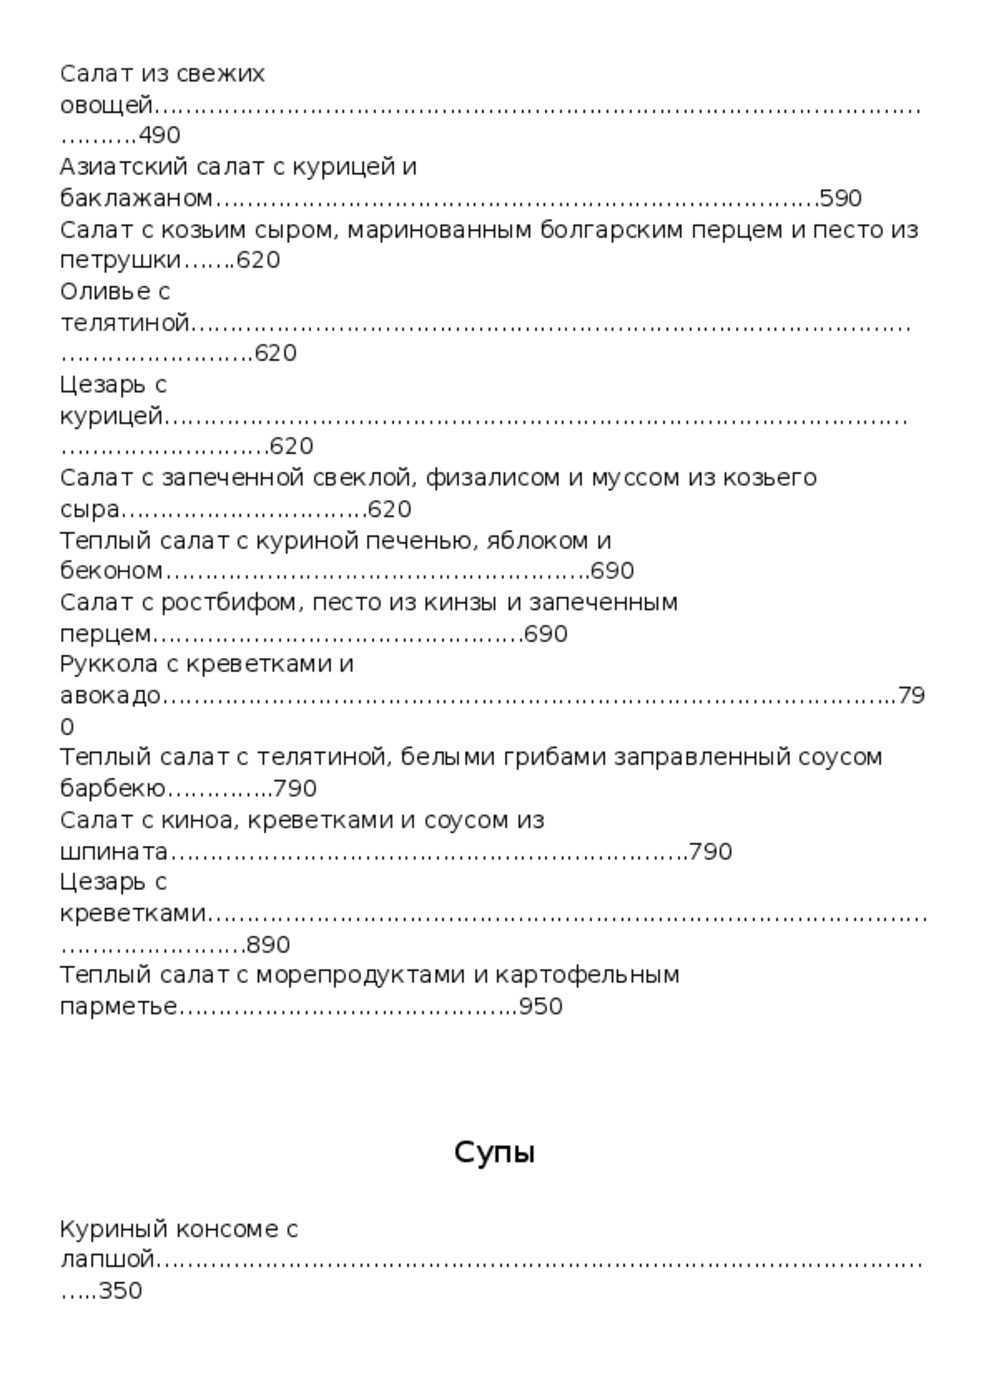 Меню бара, ресторана Simple Pleasures (Симпл Плэжерс) на улице Сретенка